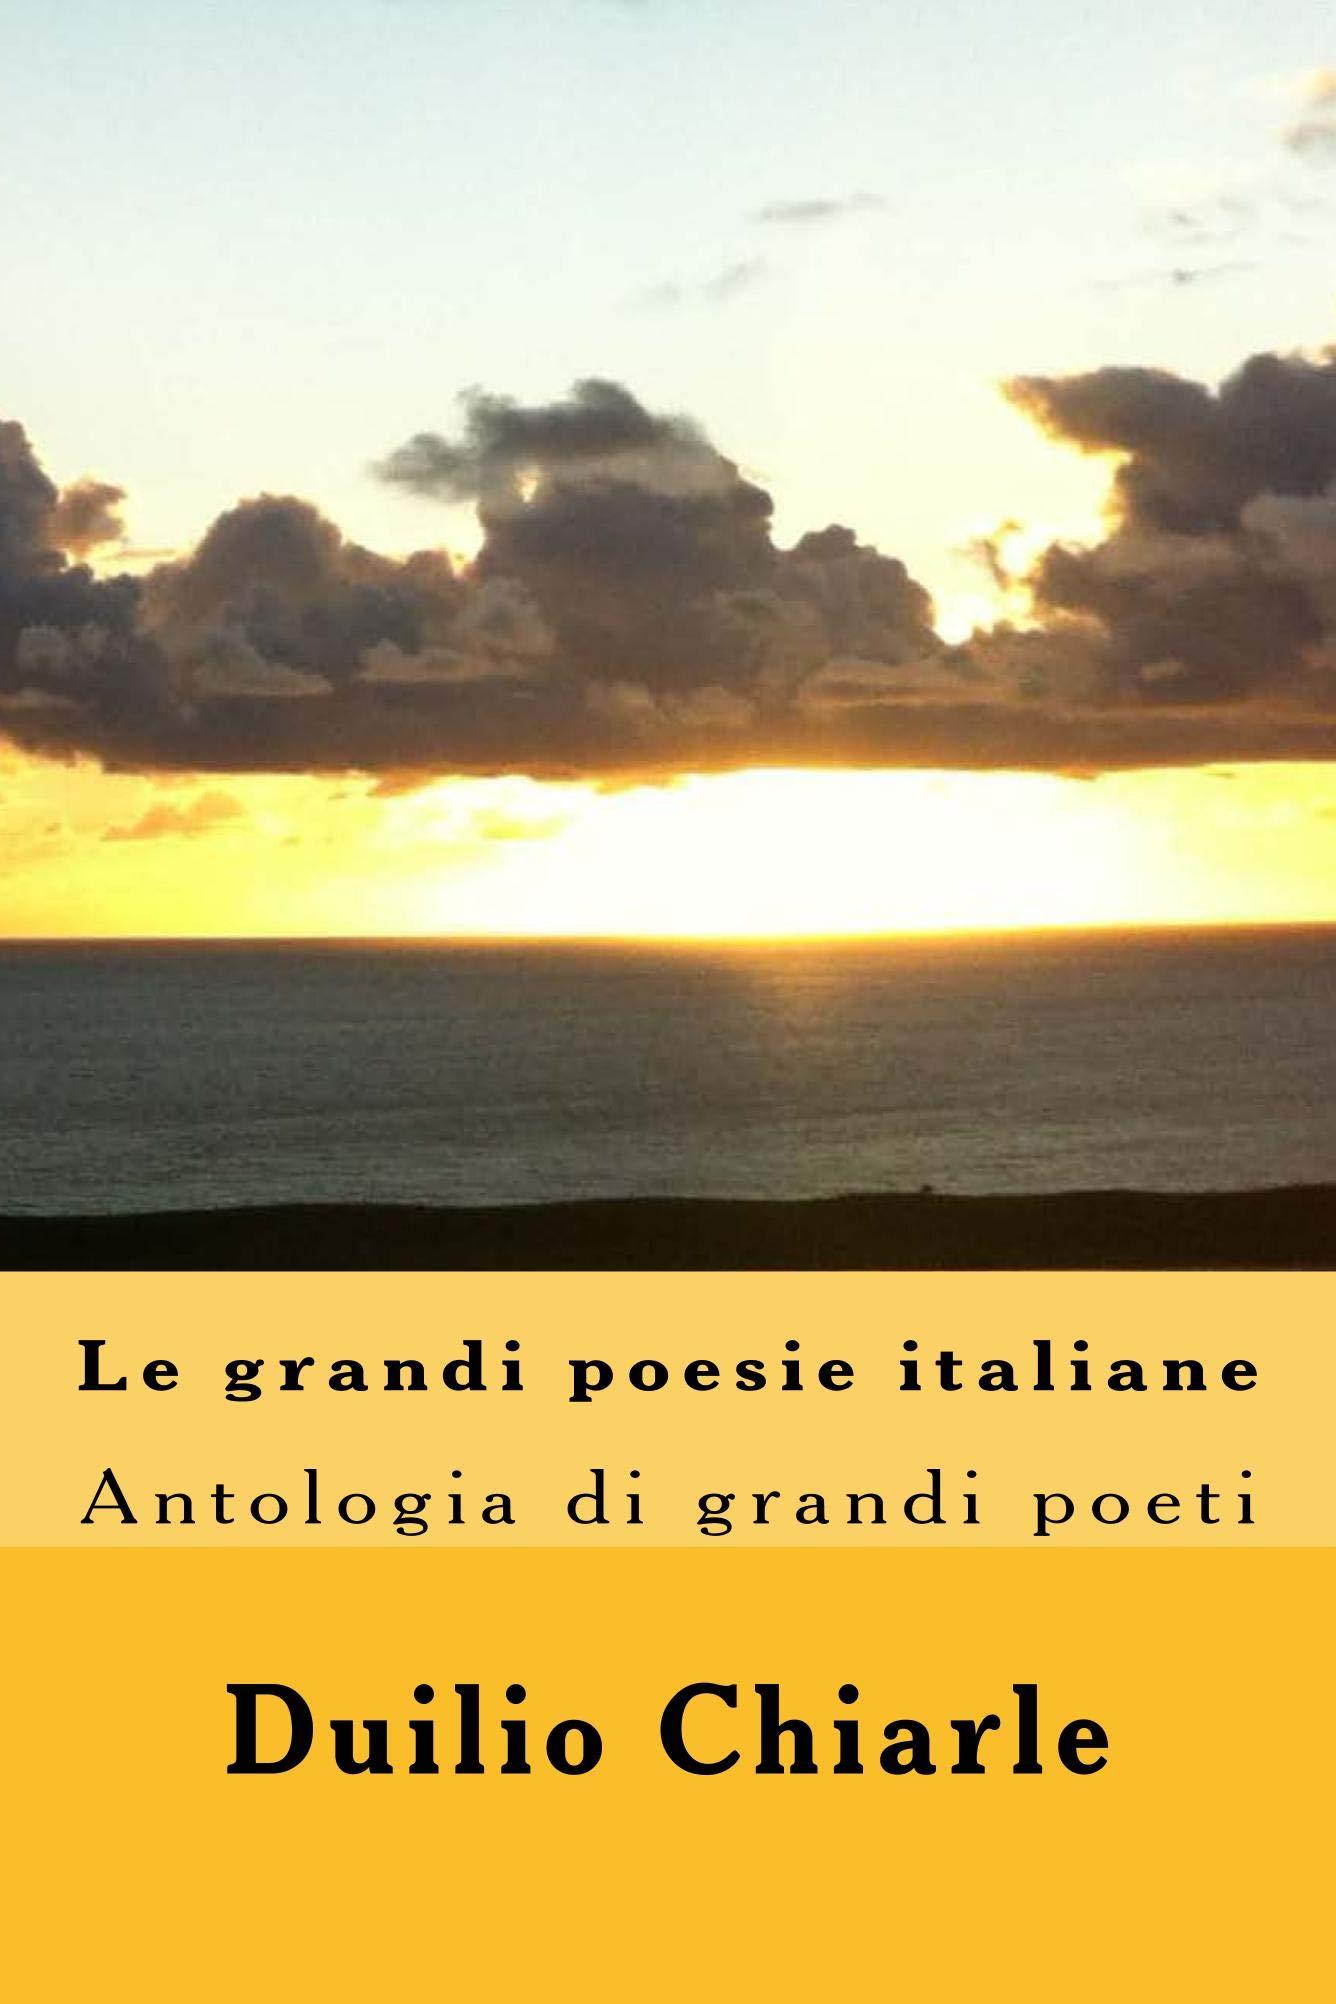 LE GRANDI POESIE ITALIANE Volume 1 (Italian Edition)